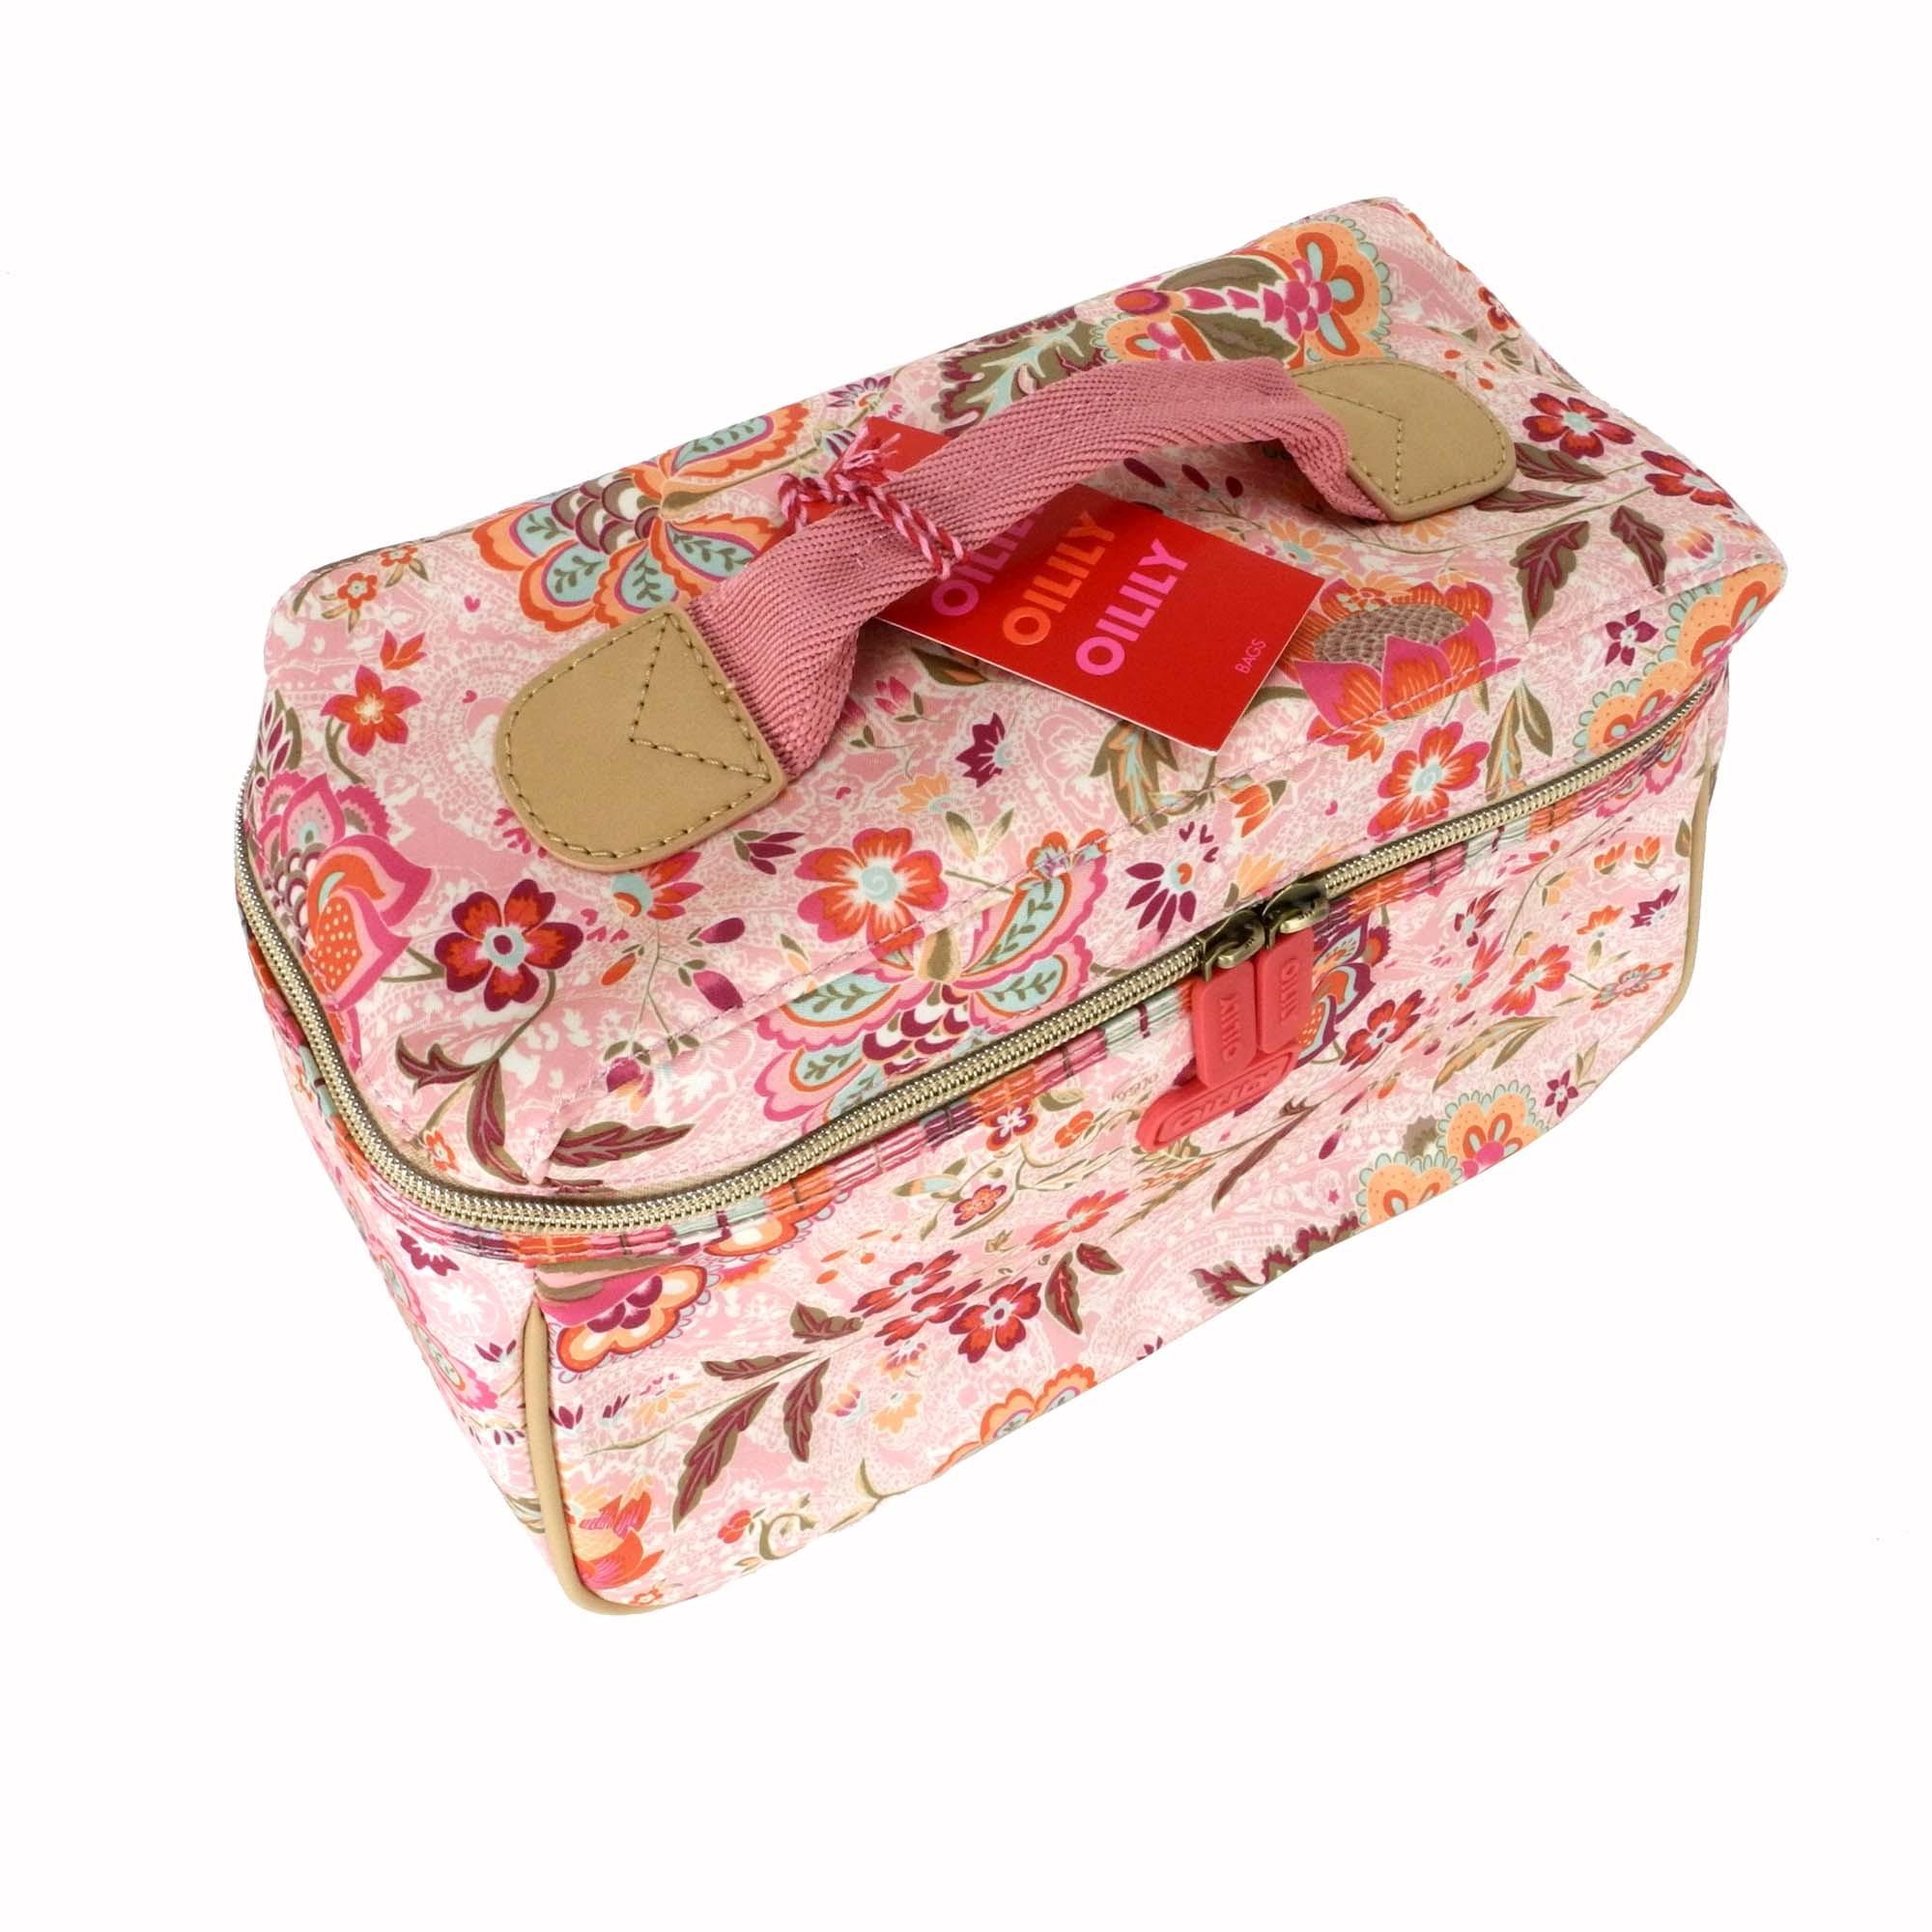 oilily kosmetiktasche l beauty case summer blossom peach pink ebay. Black Bedroom Furniture Sets. Home Design Ideas